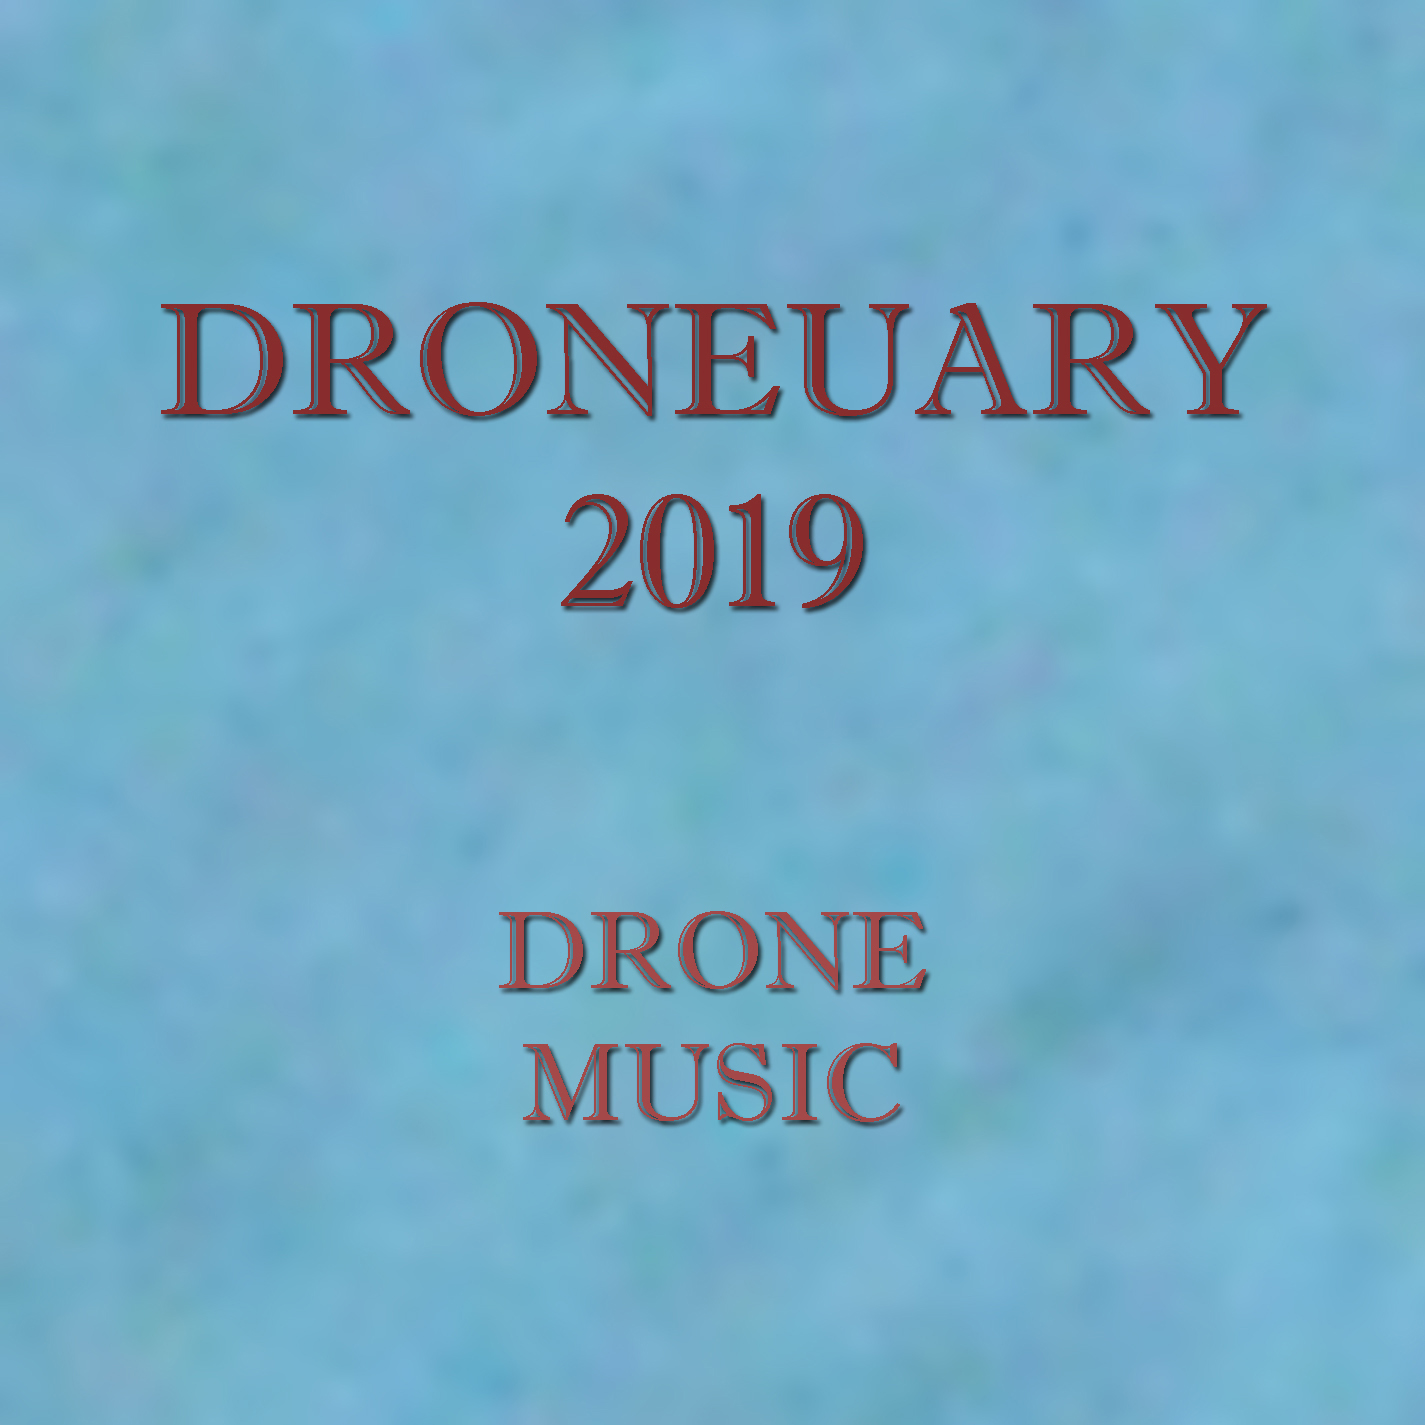 droneuary